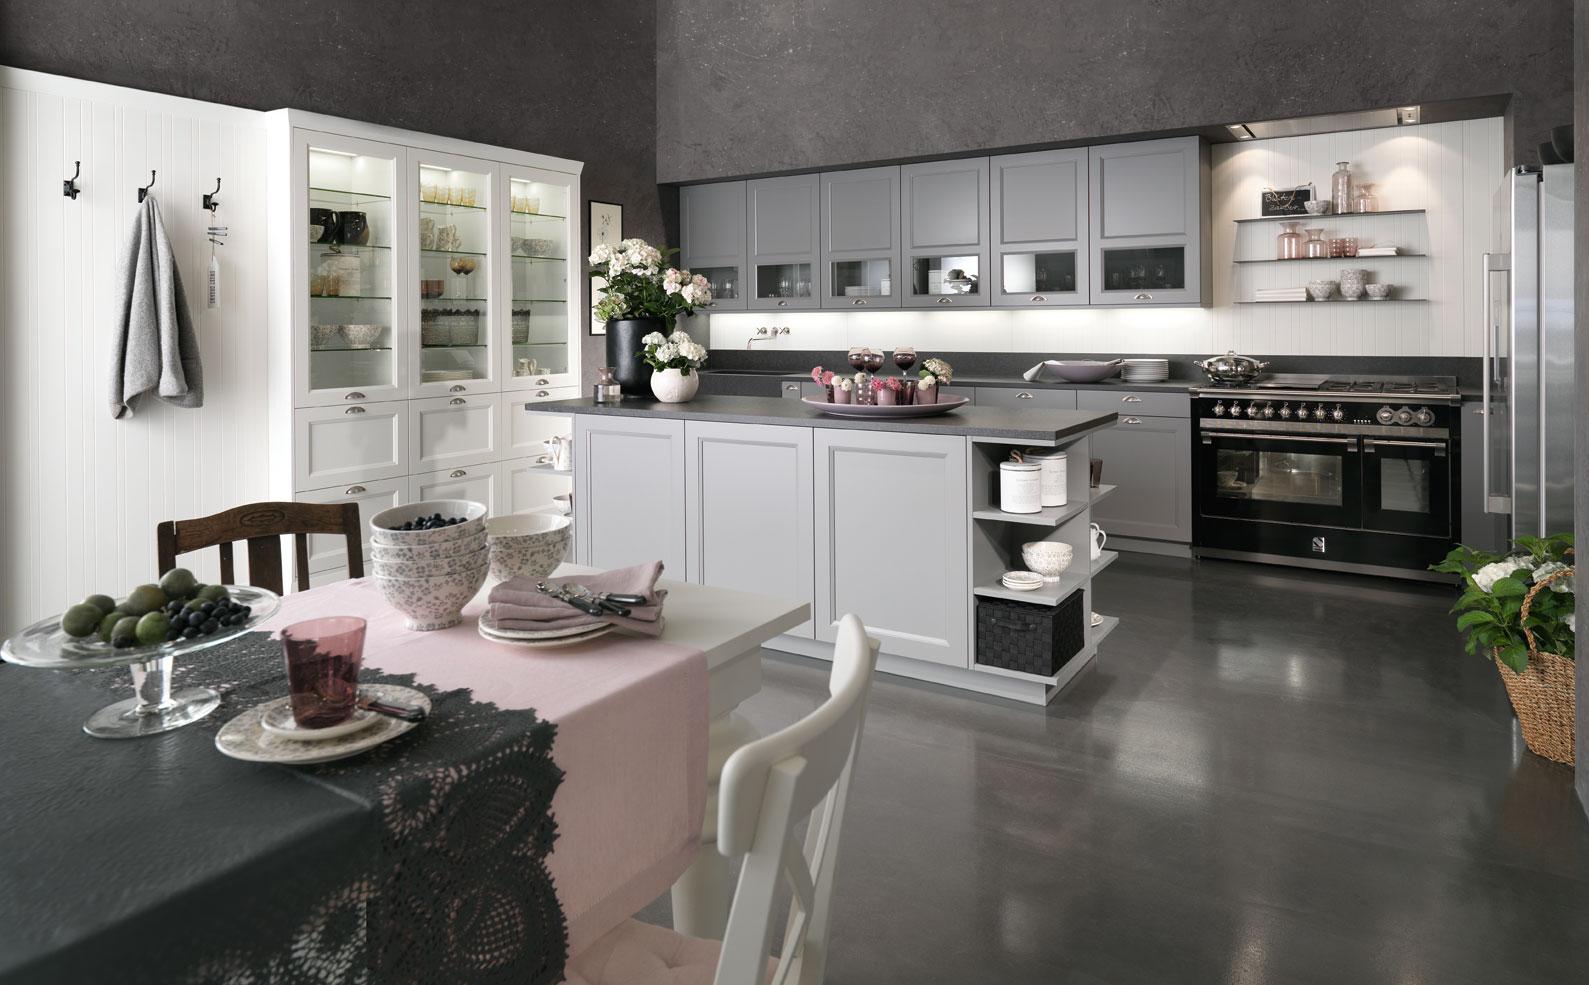 Design Keukens Opruiming: Varenna artex verdonk keukens maarssen.